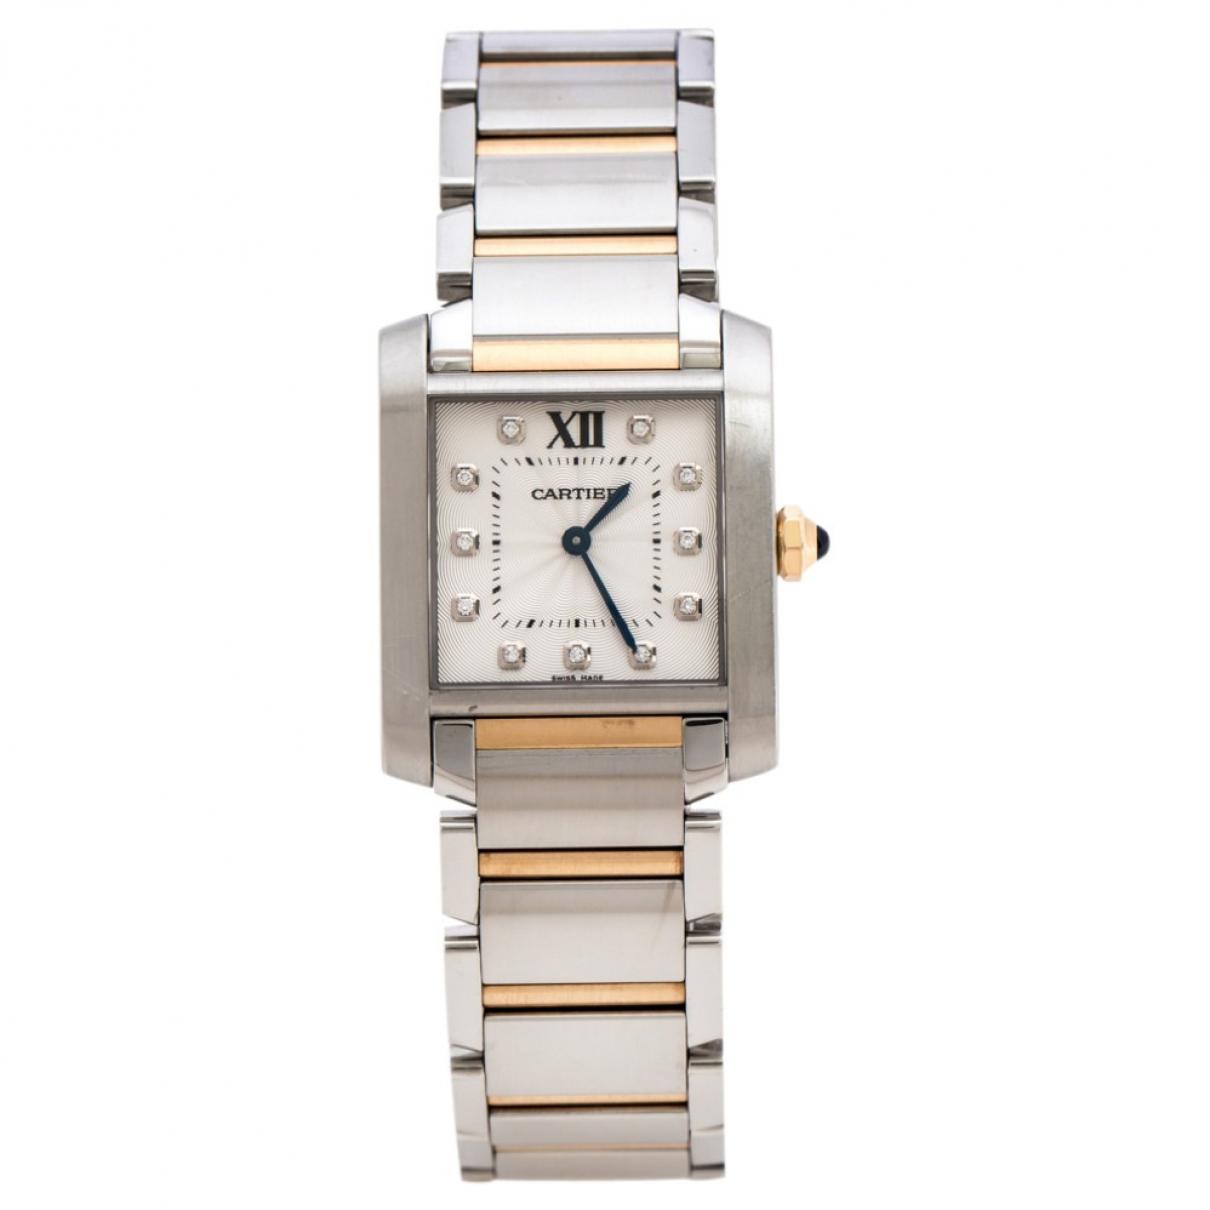 Cartier Tank Francaise Uhr in  Silber Gold und Stahl